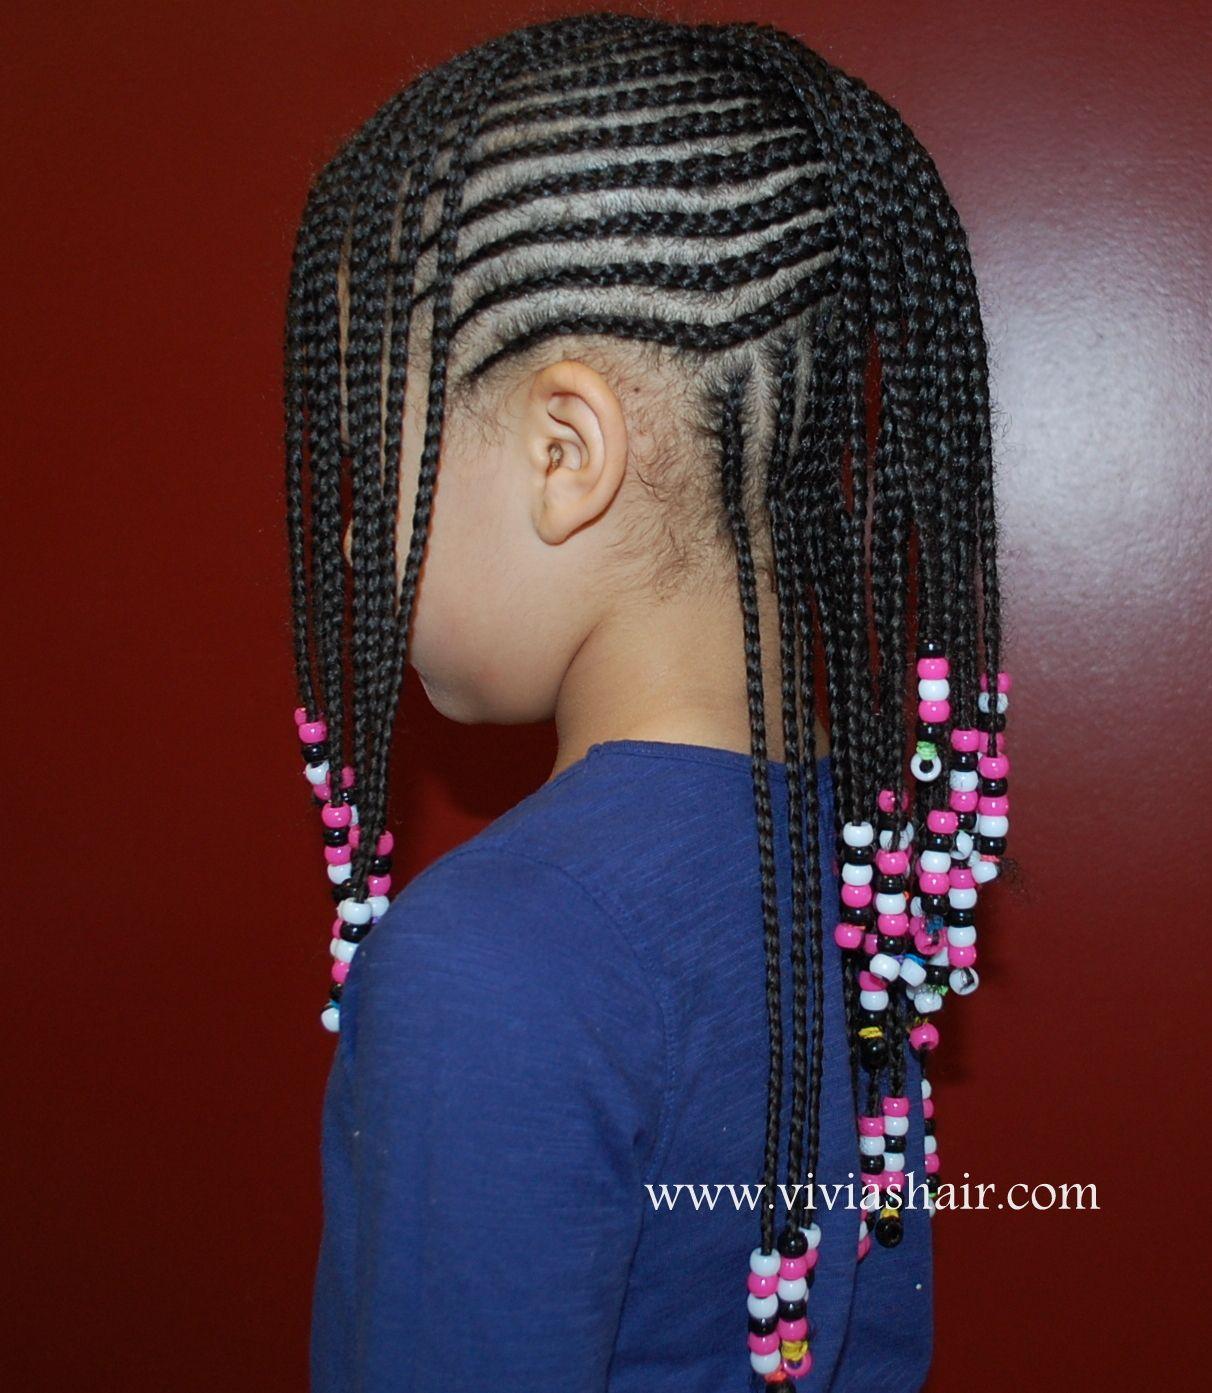 hair braids salon va | cornrows & mohawks | pinterest | salons